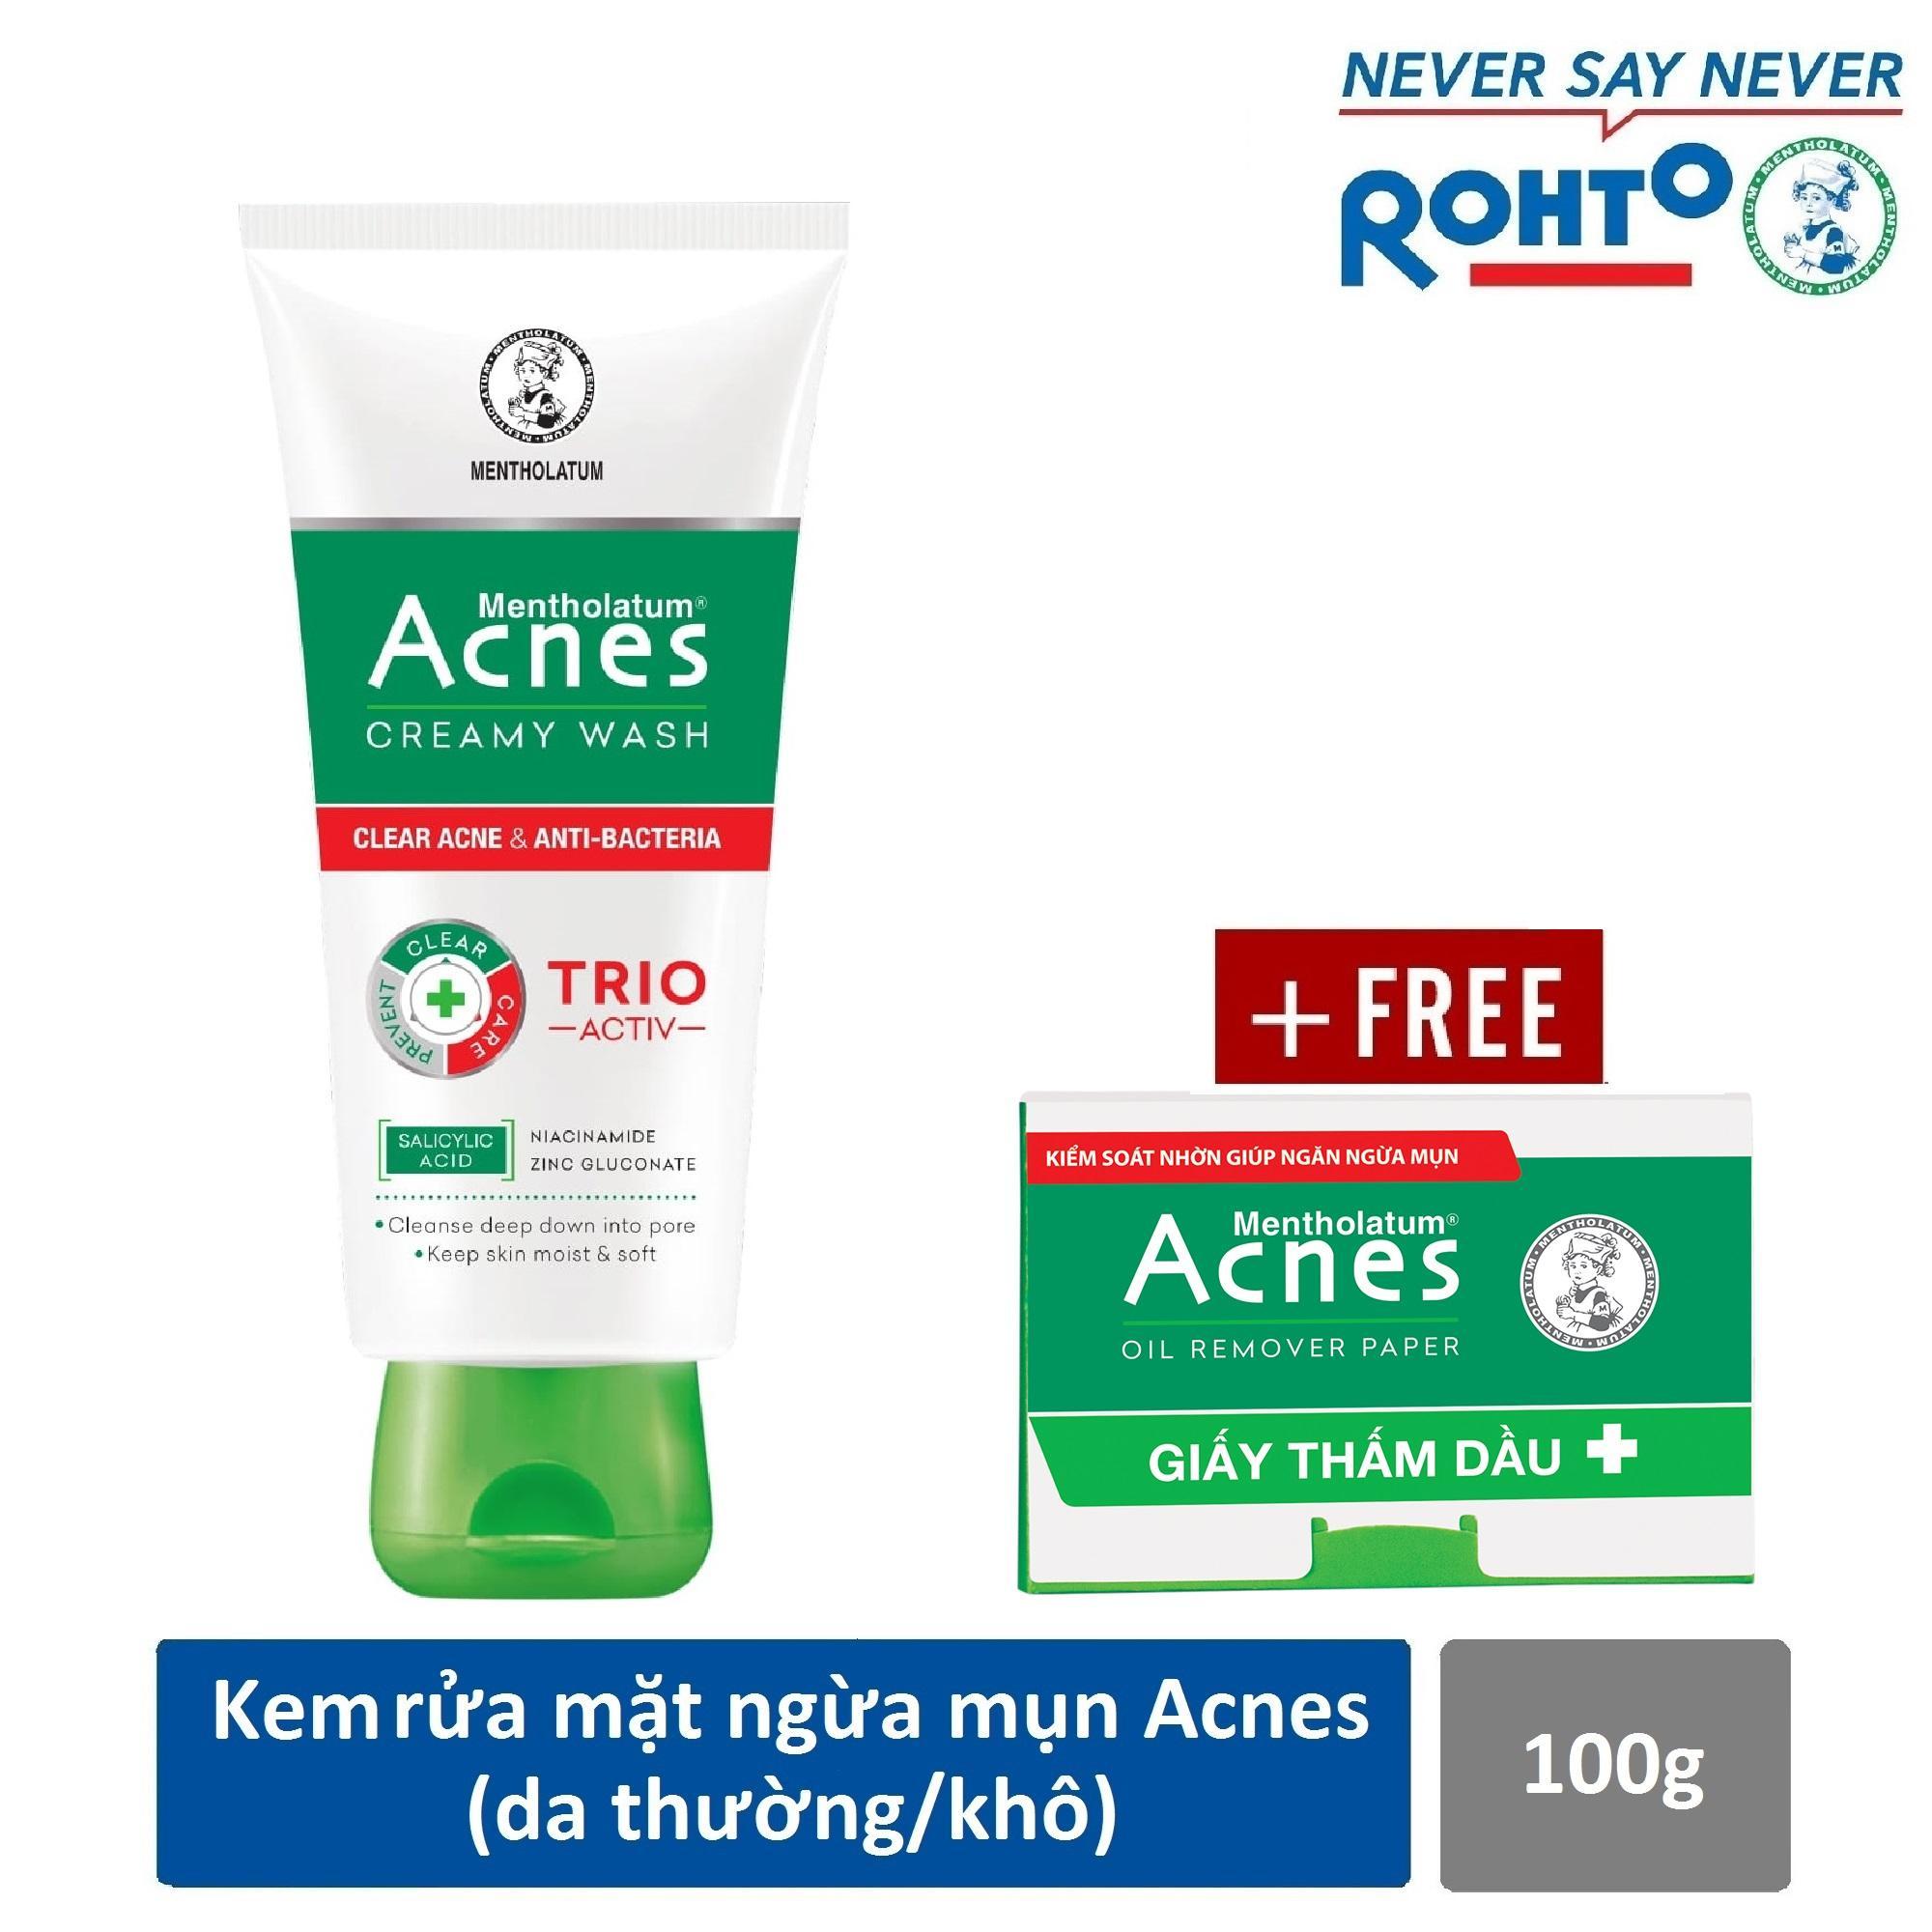 Sữa rửa mặt ngăn ngừa mụn Acnes Creamy Wash 100g + Tặng Giấy thấm dầu Acnes Oil Remover 50 tờ cao cấp